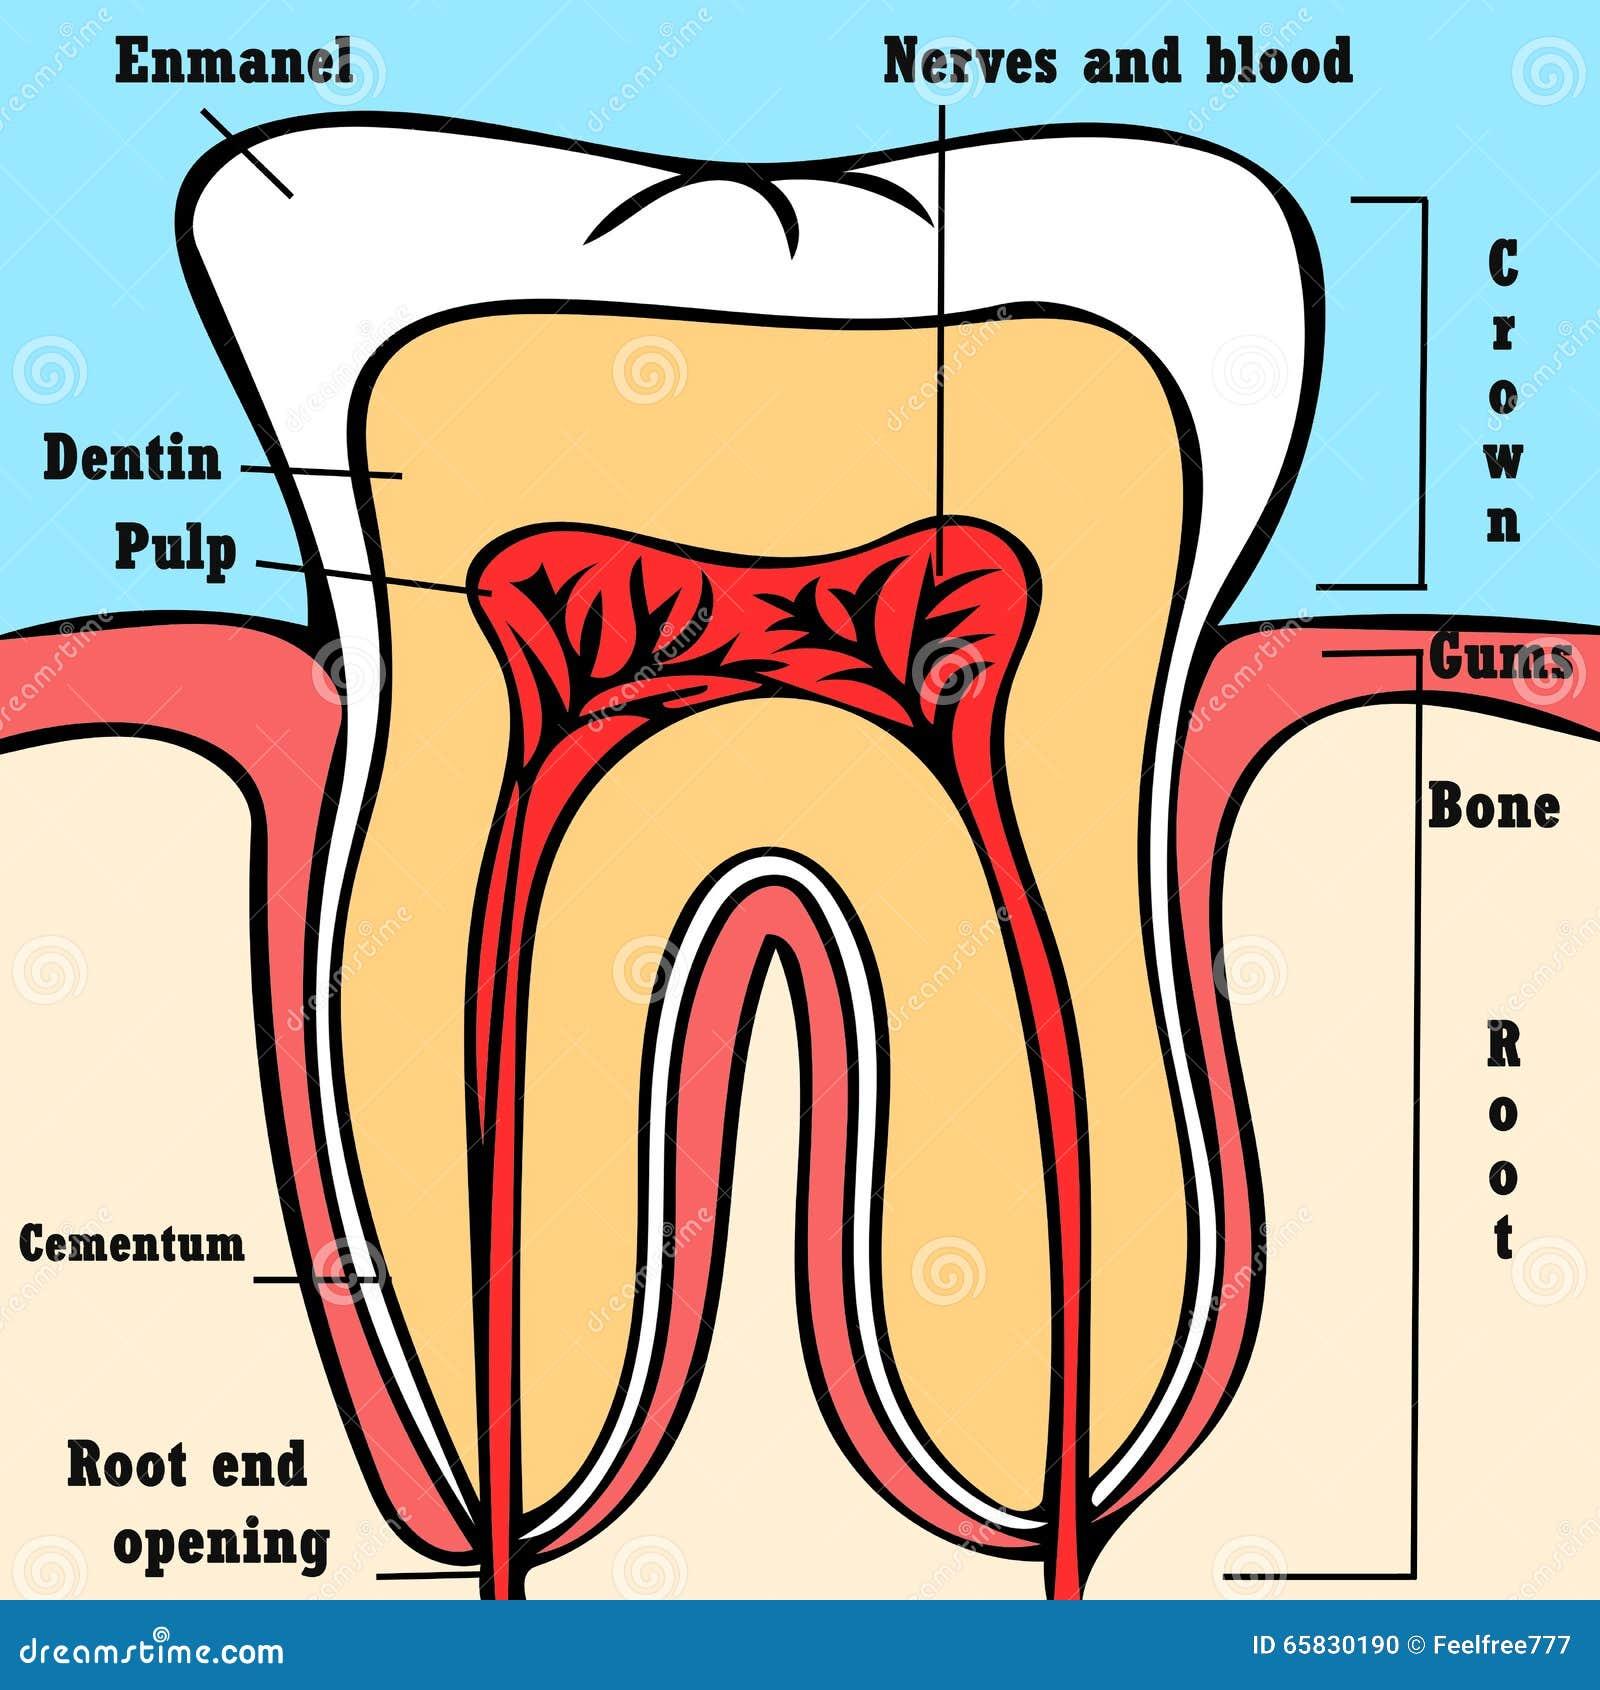 Tooth anatomy scheme stock illustration. Illustration of anatomy ...